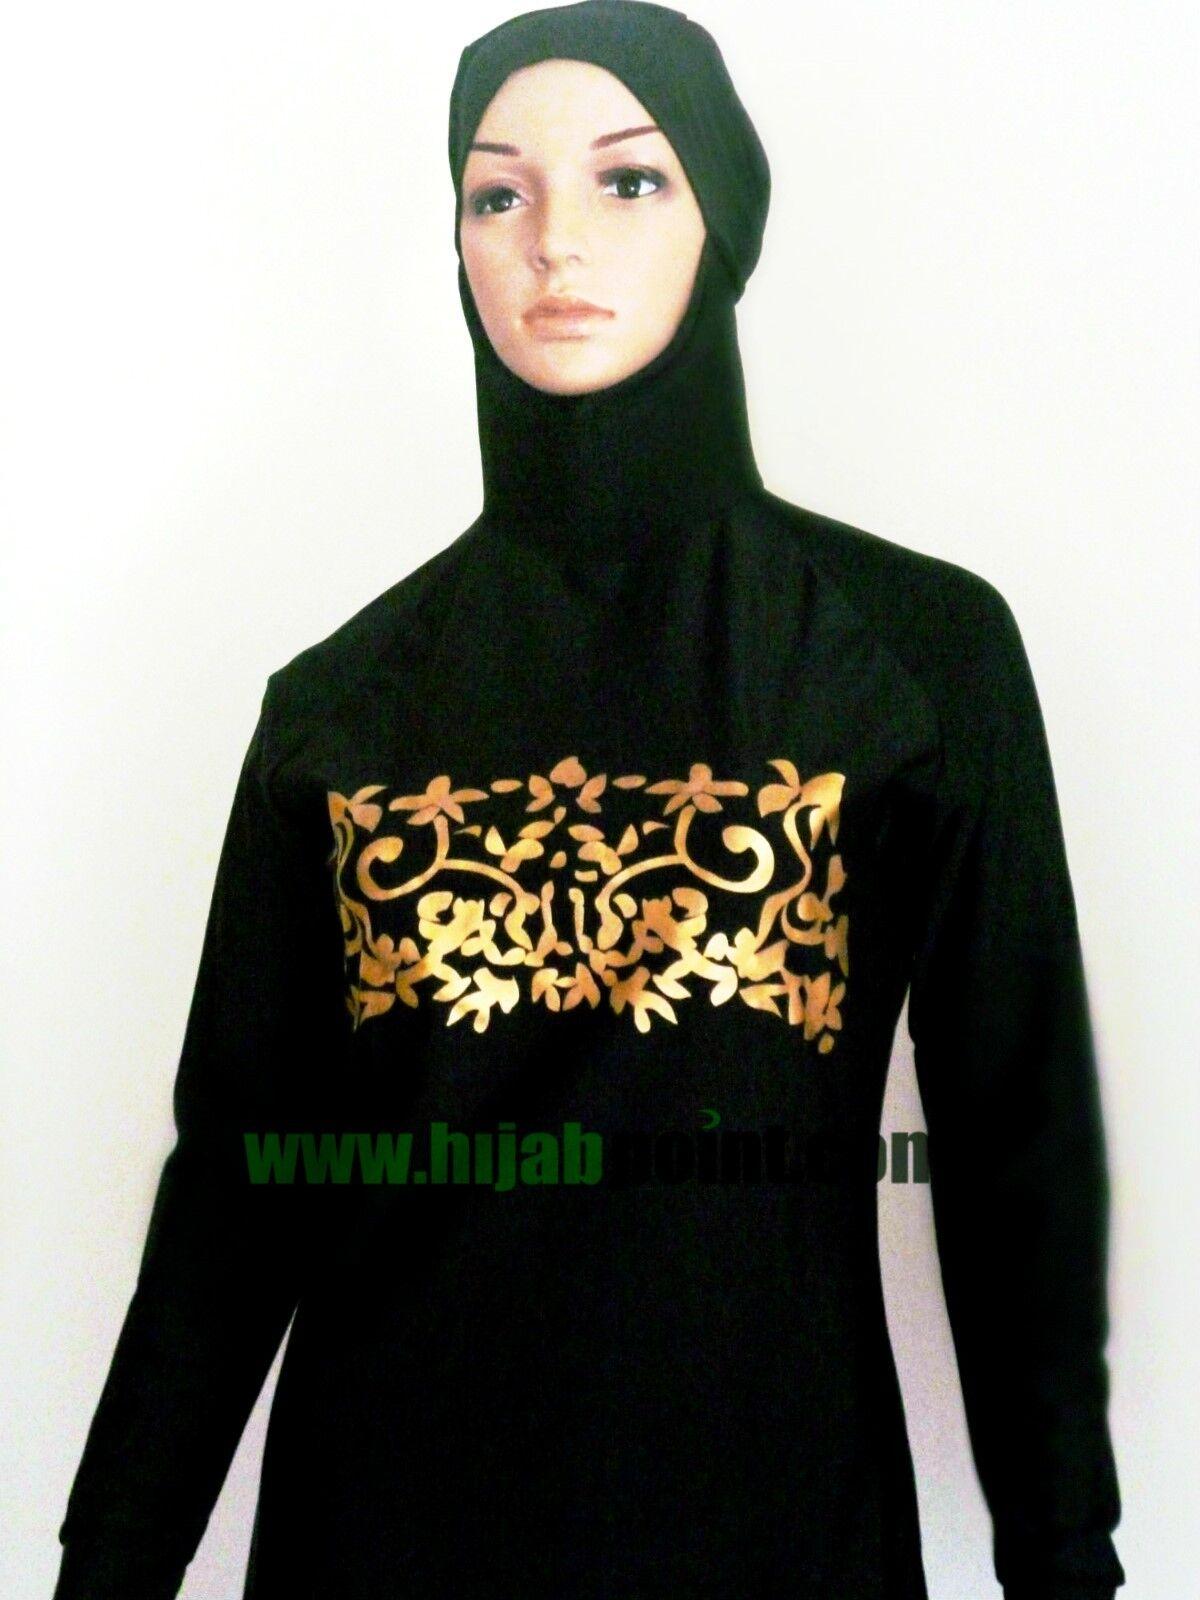 Ladies Modest Muslim Burqini Two Piece Beachwear Swimsuit Swimwear Islamic Girls